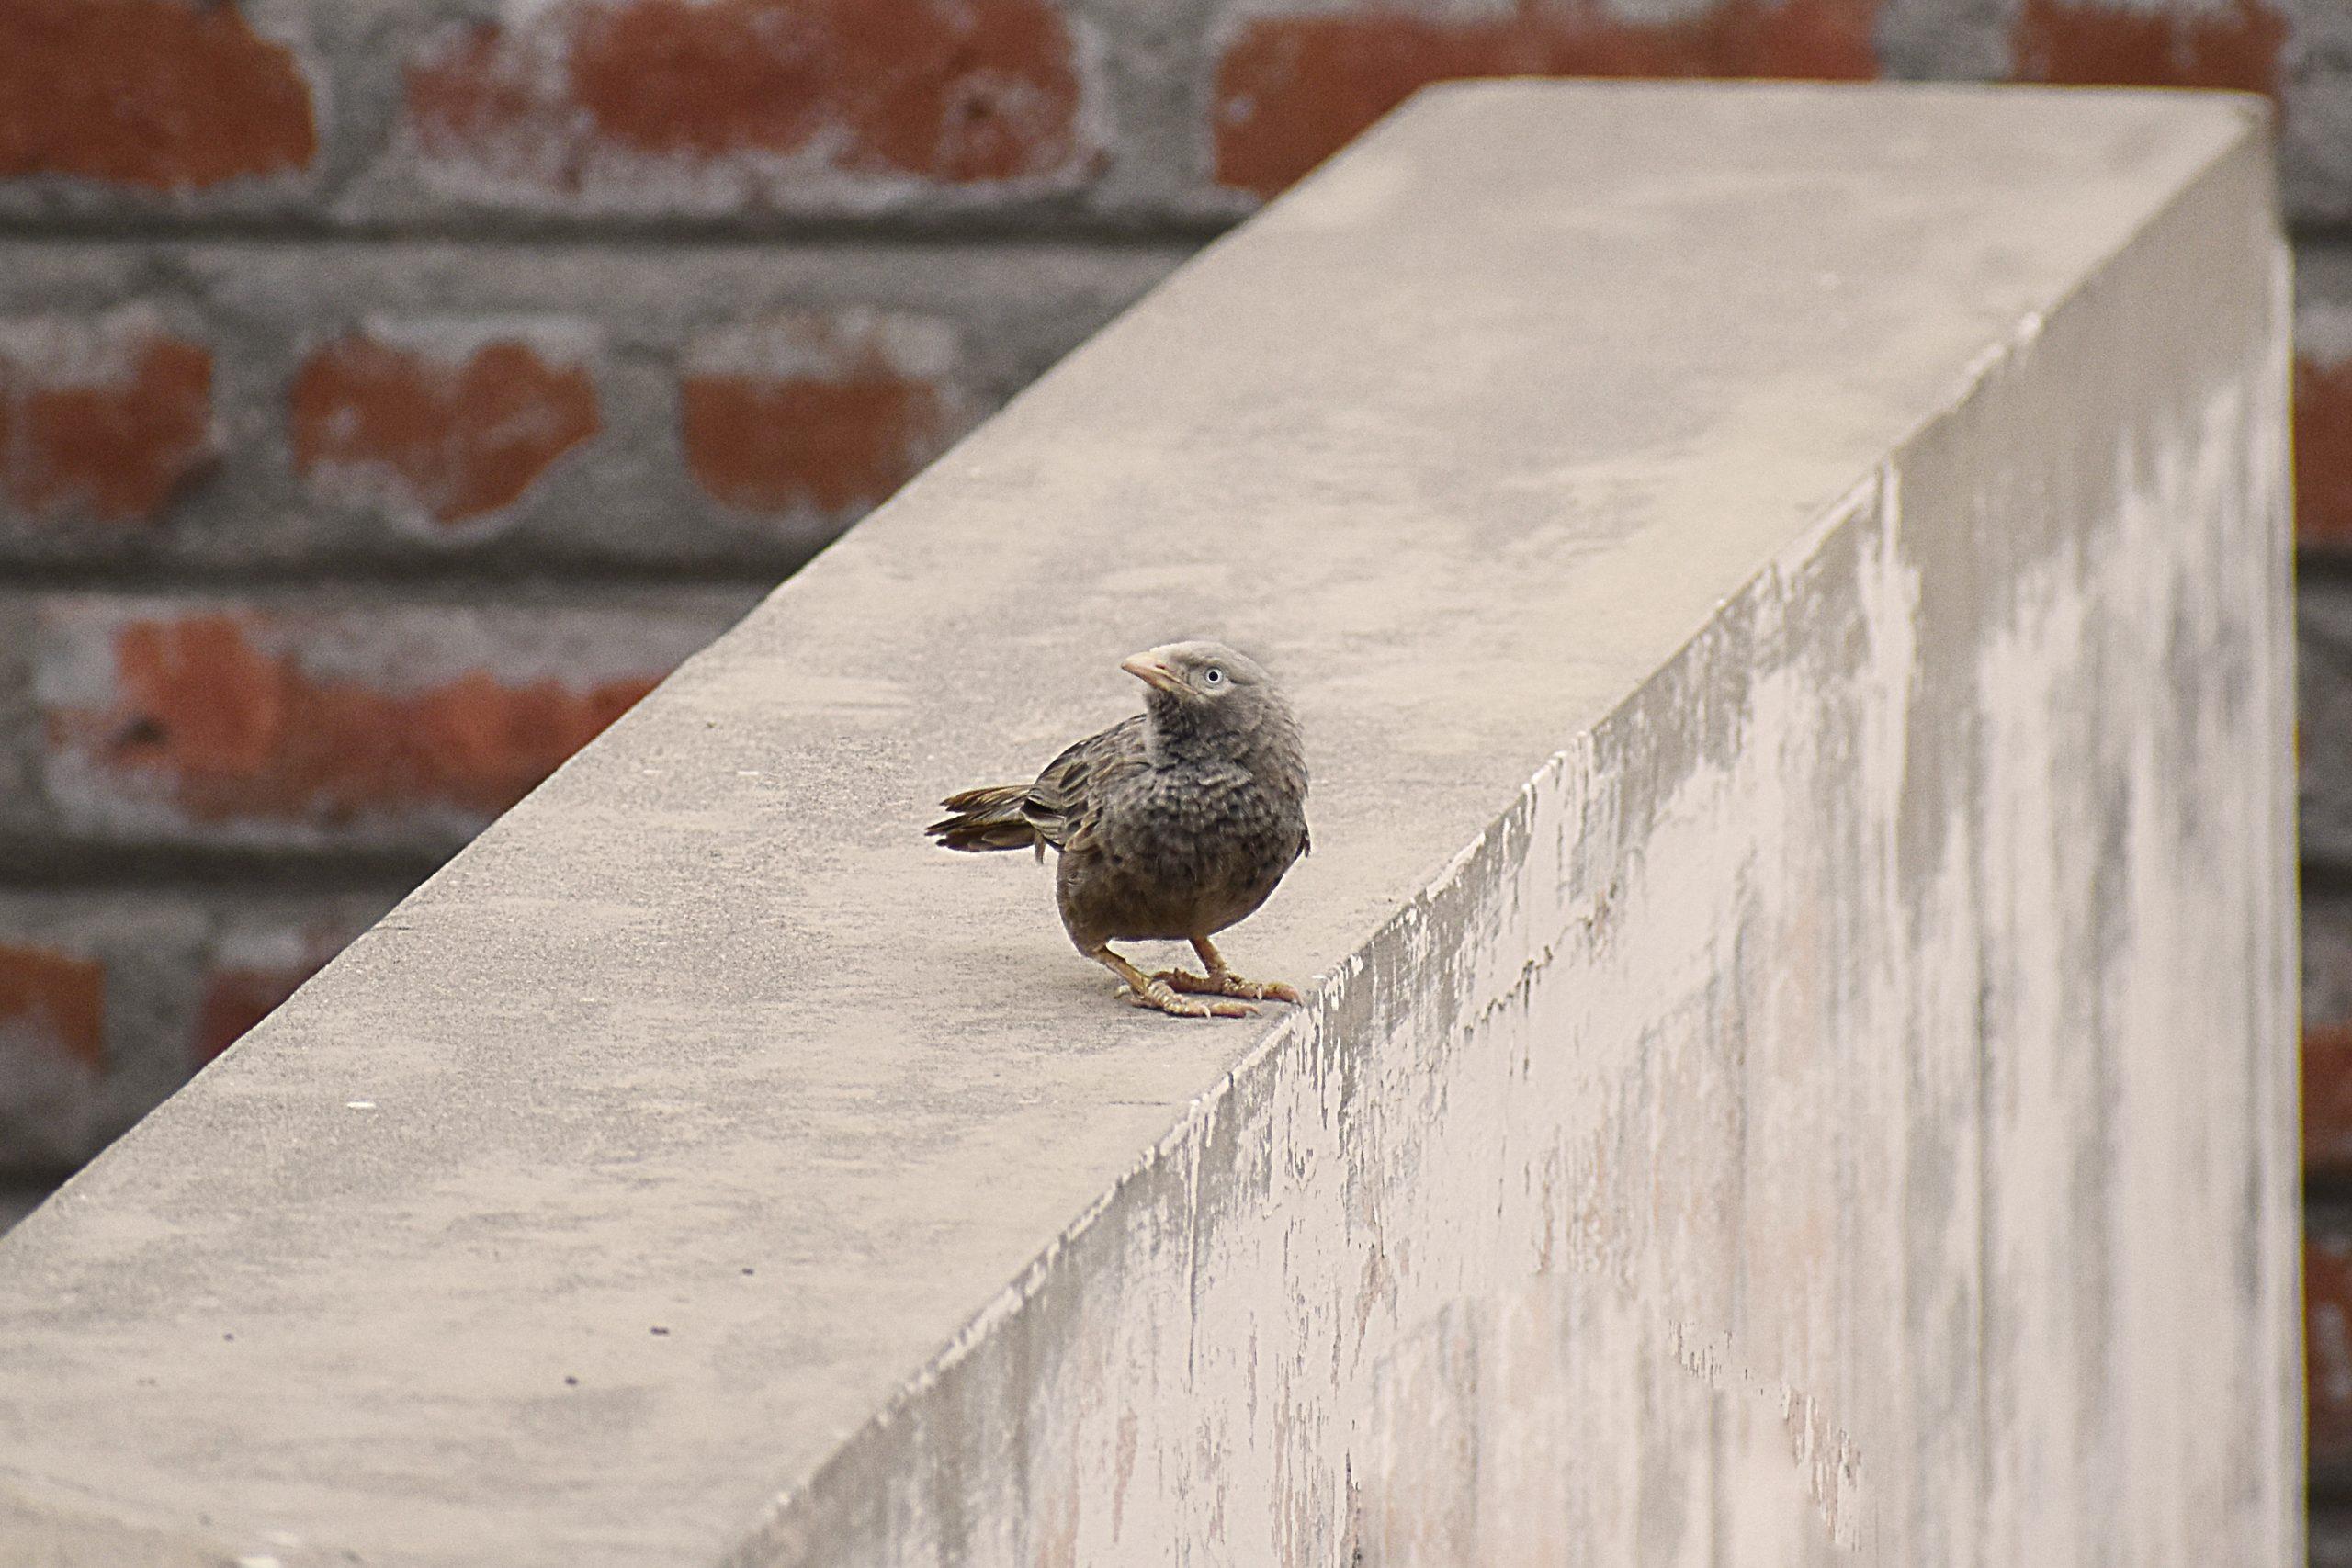 Bird sitting on wall